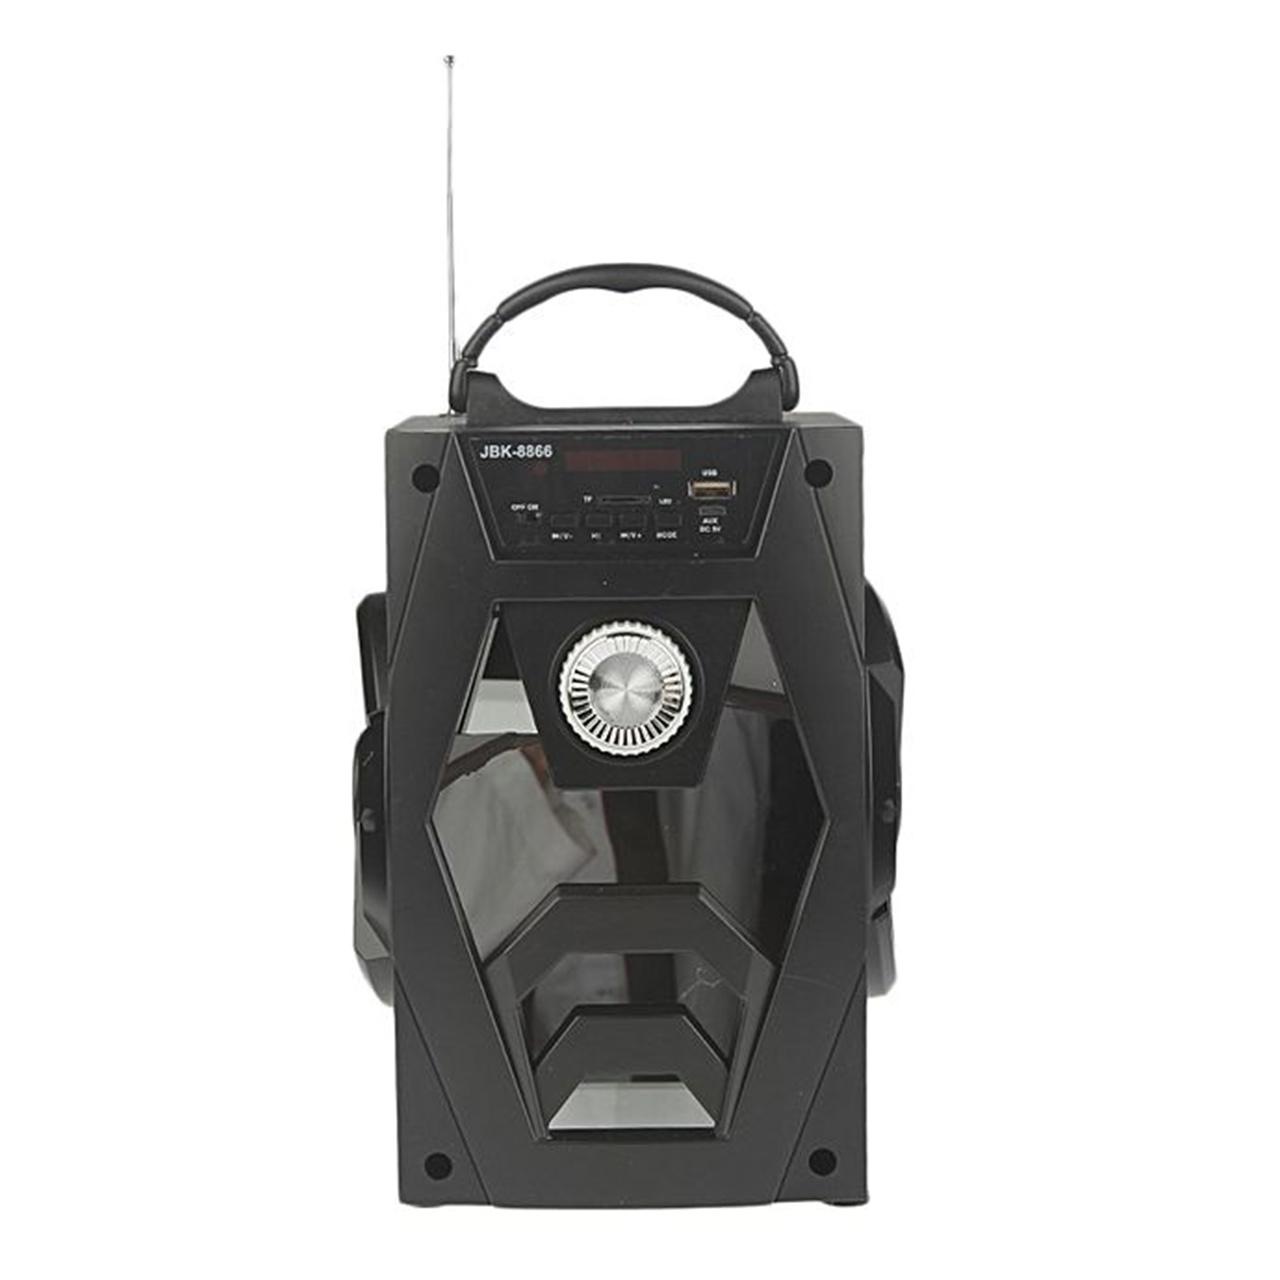 اسپیکر بلوتوثی مدل JBK-8866